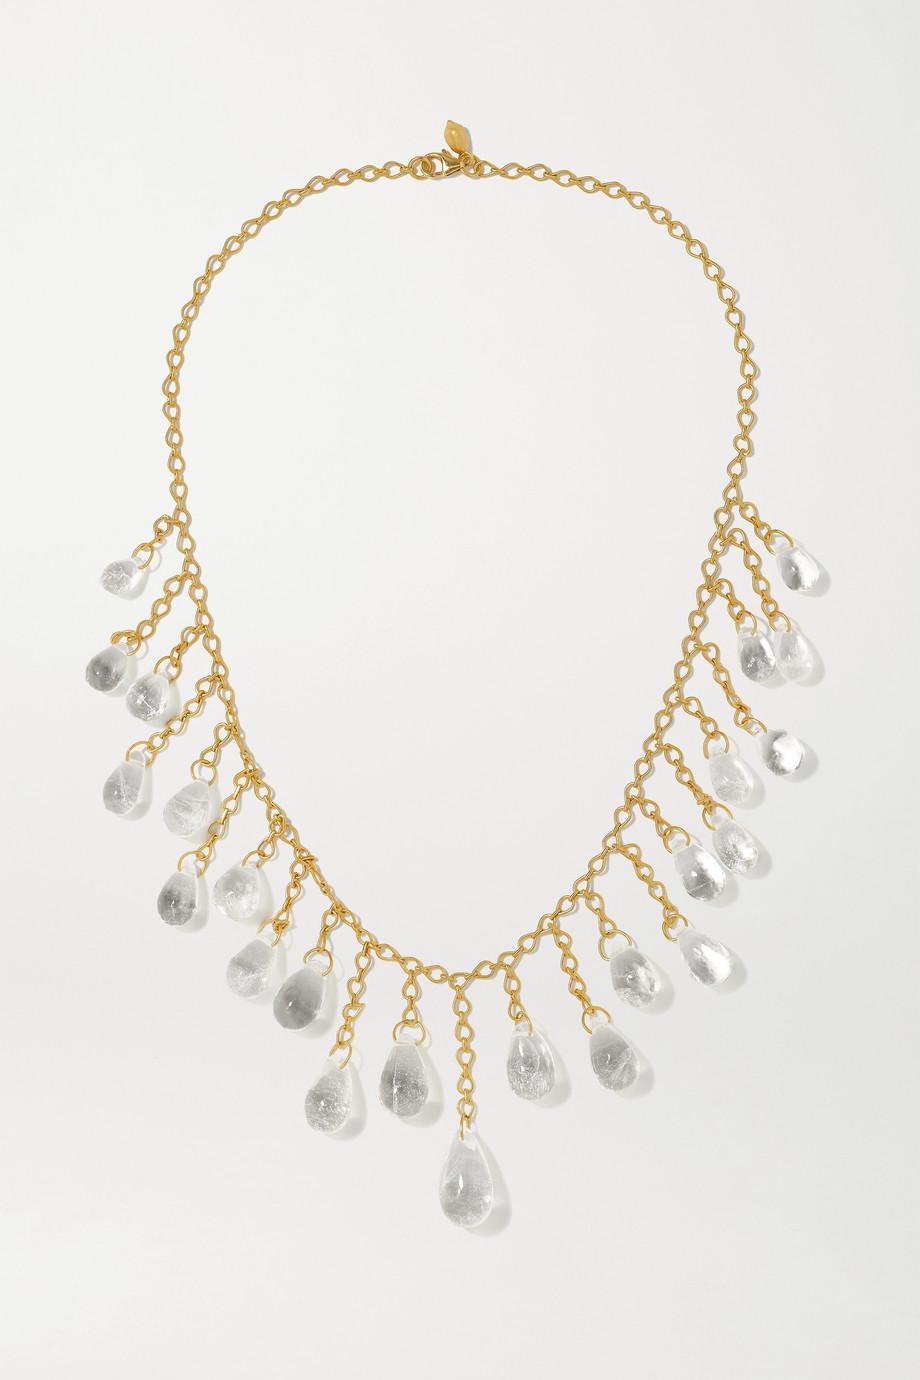 Pippa Small Collier en or 18carats et quartz